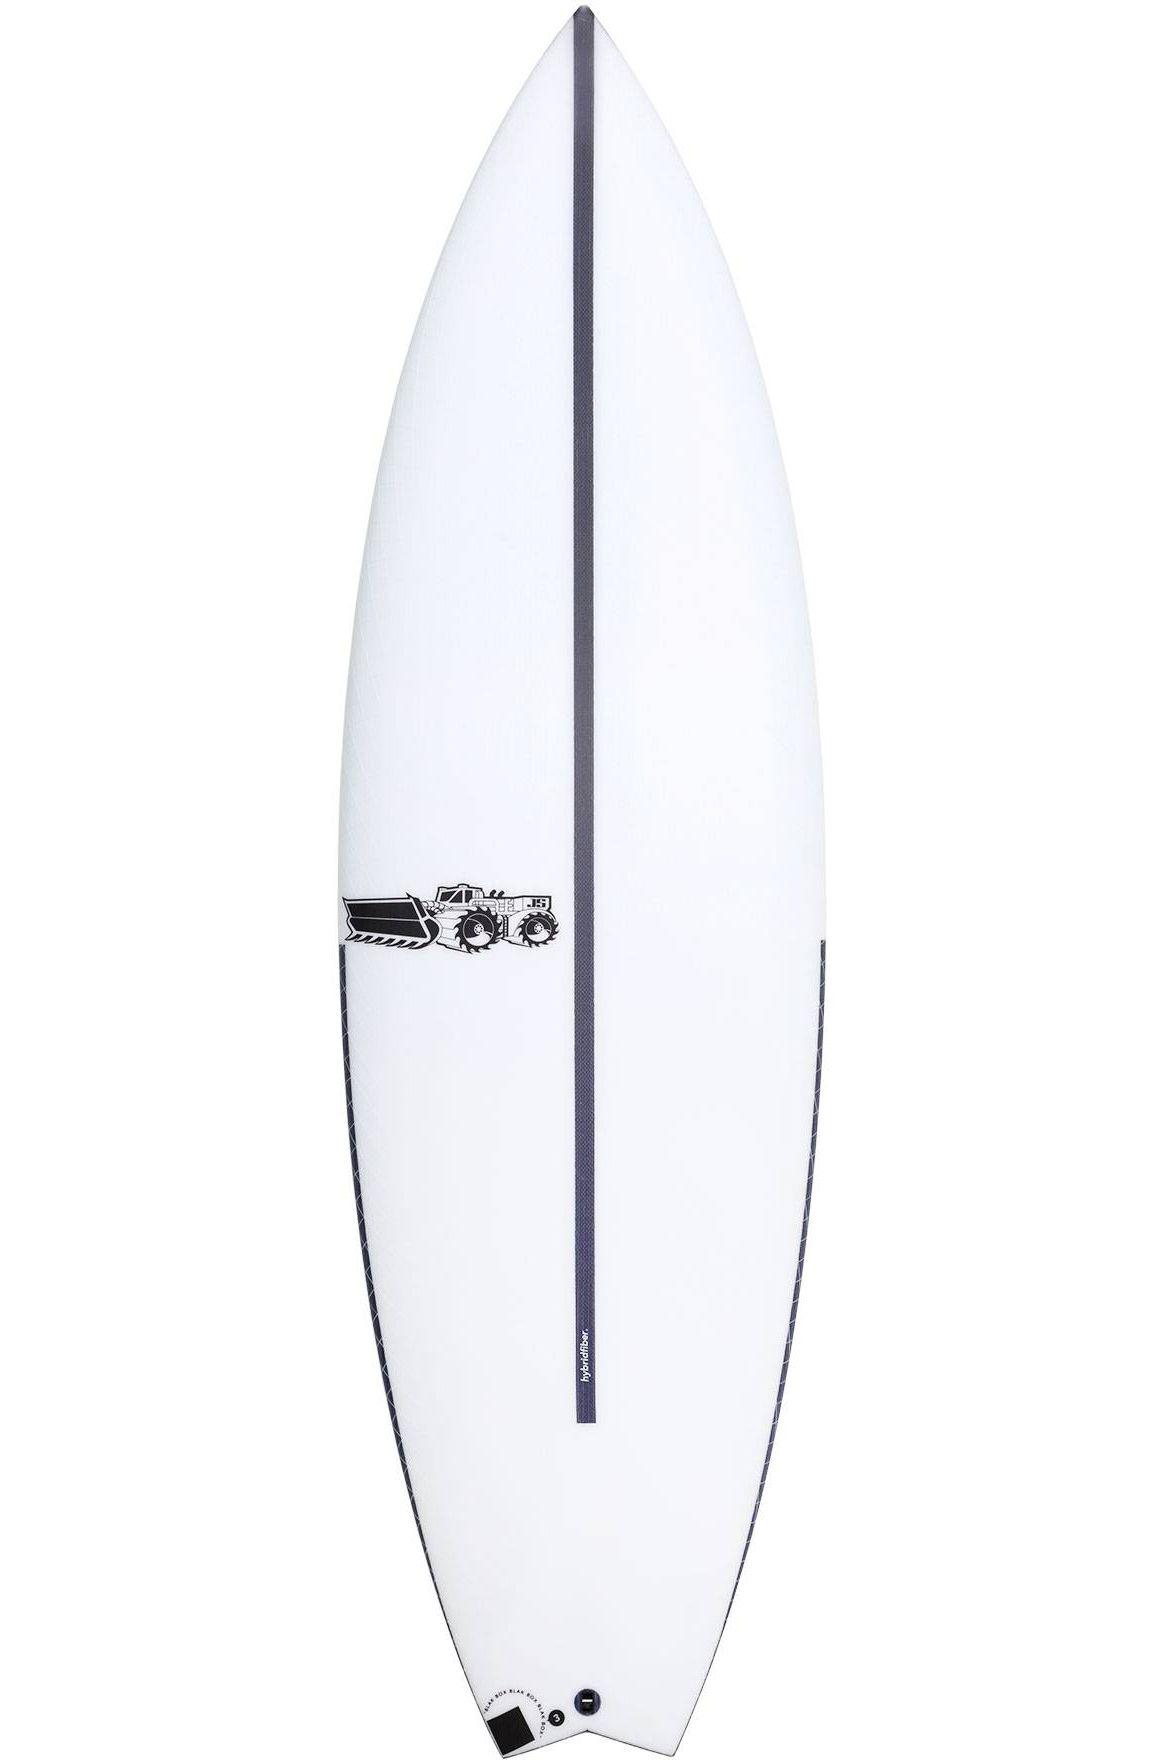 Prancha Surf JS 5'6 BLAK BOX 3 HYFI Swallow Tail - Color FCS II Multisystem 5ft6